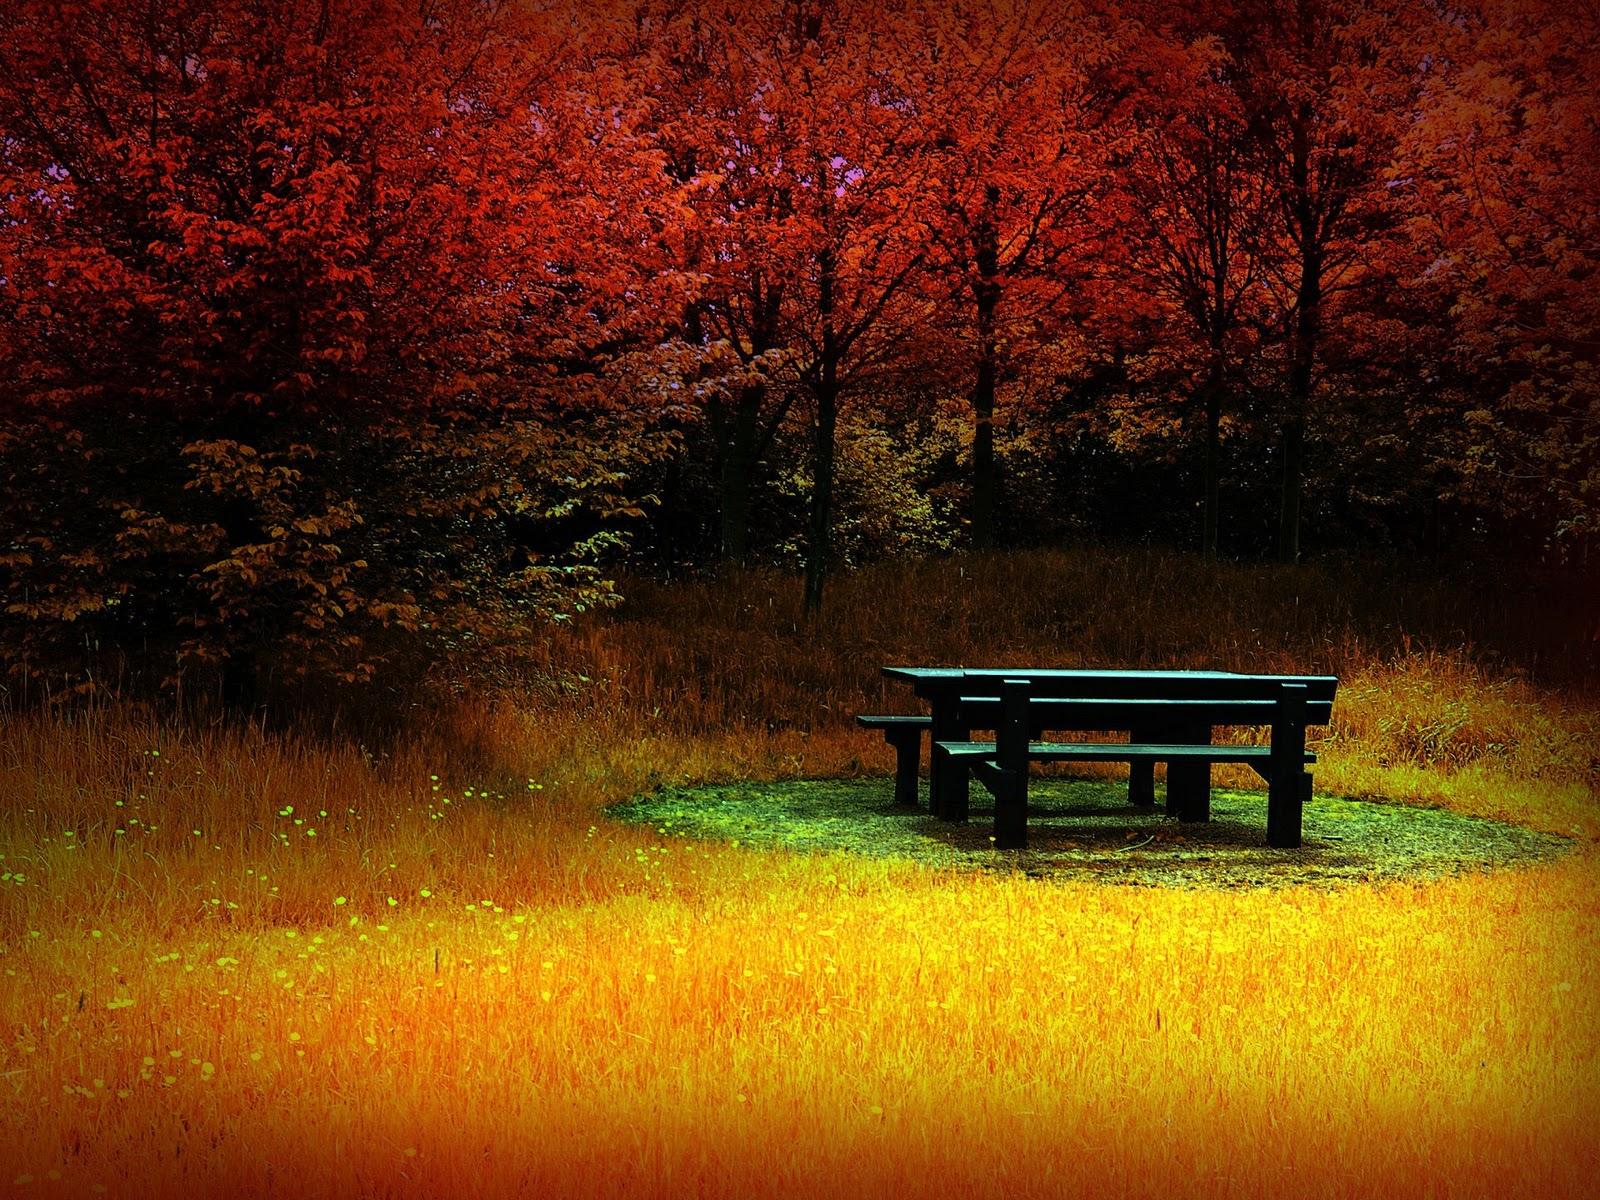 vermont in autumn hd wallpaper - photo #26